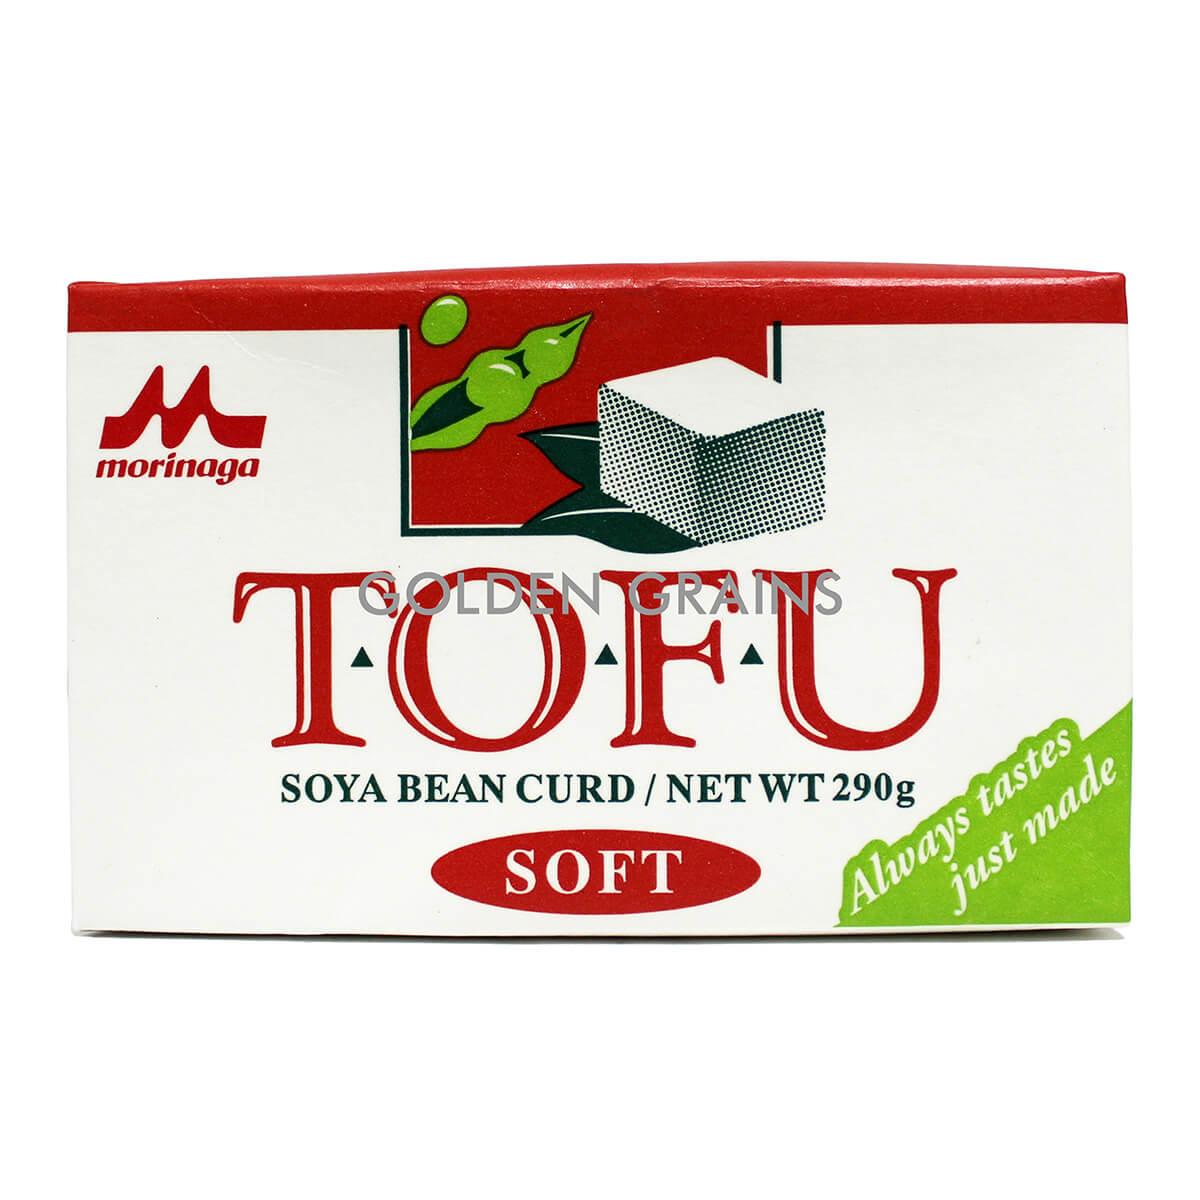 Golden Grains Dubai Export - Morinaga - Tofu Red - Front.jpg